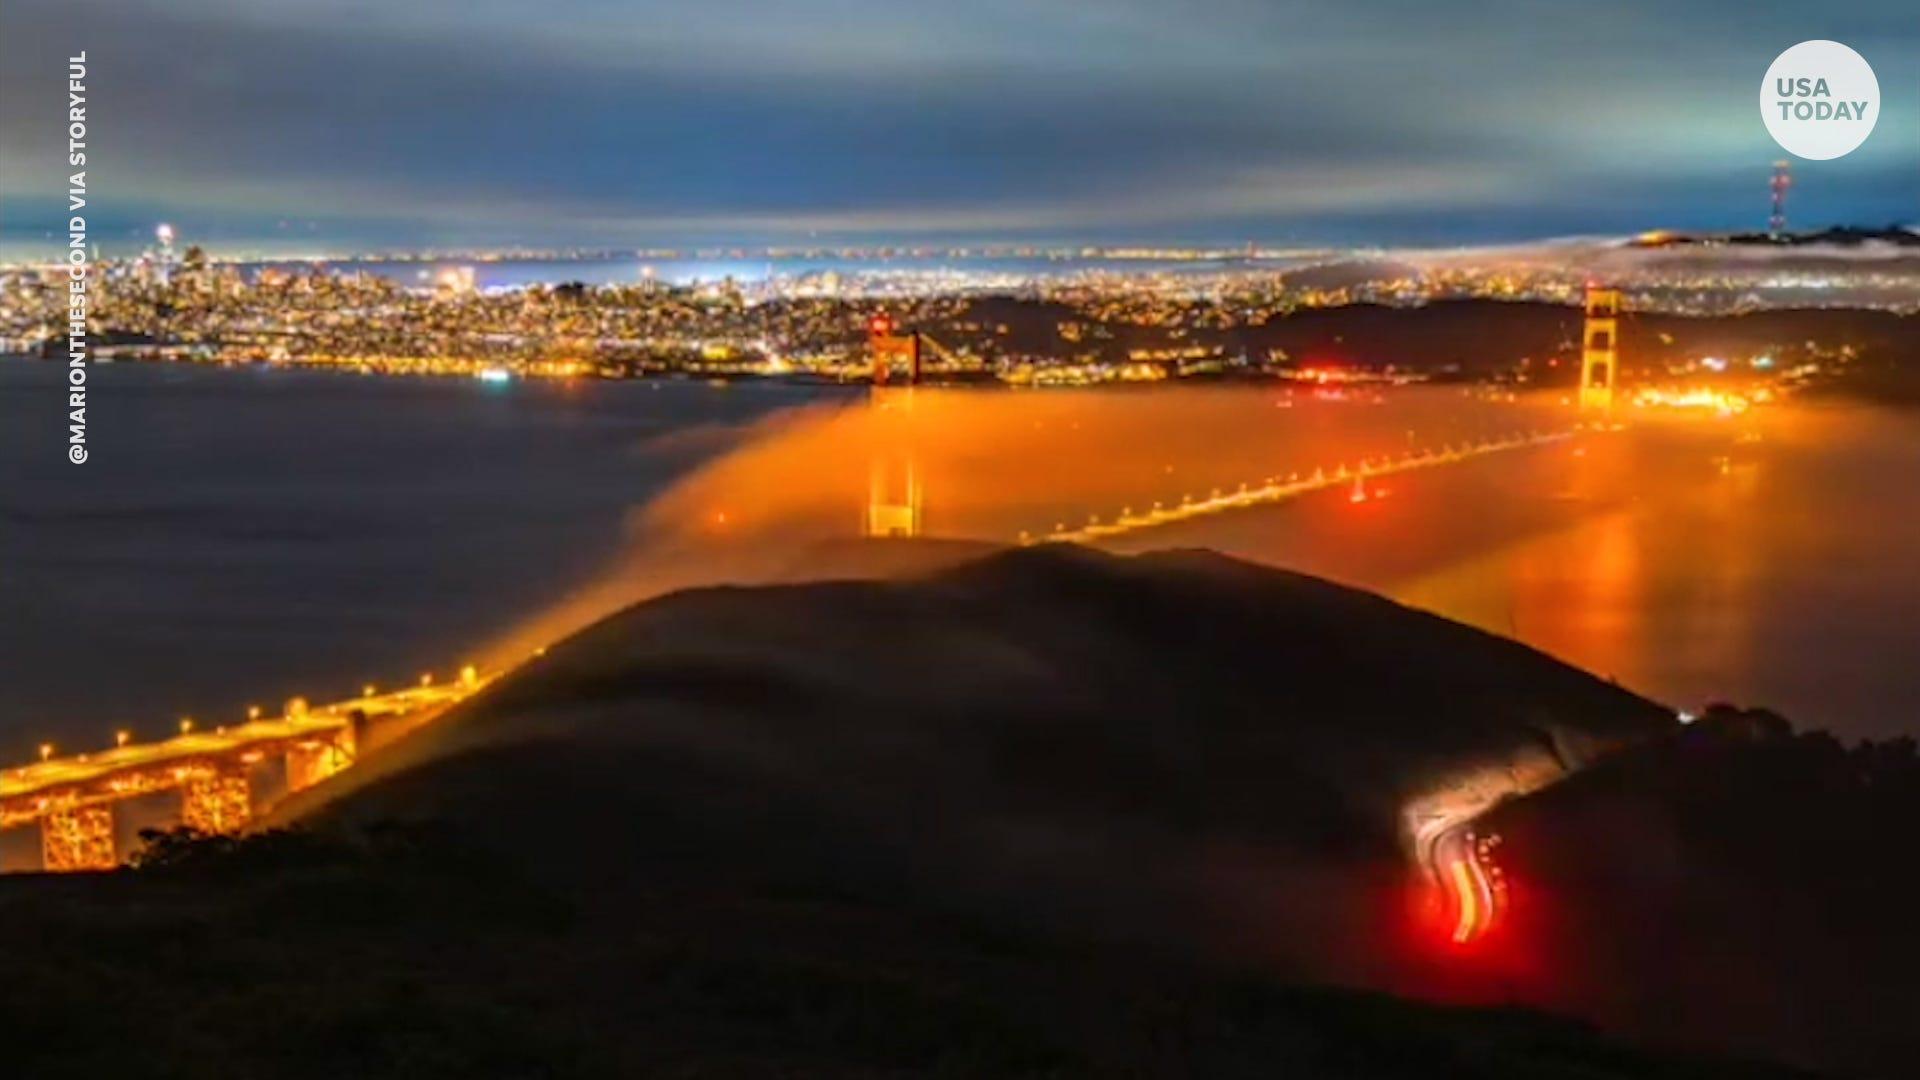 Time lapse: Golden Gate Bridge glows behind foggy San Francisco bay